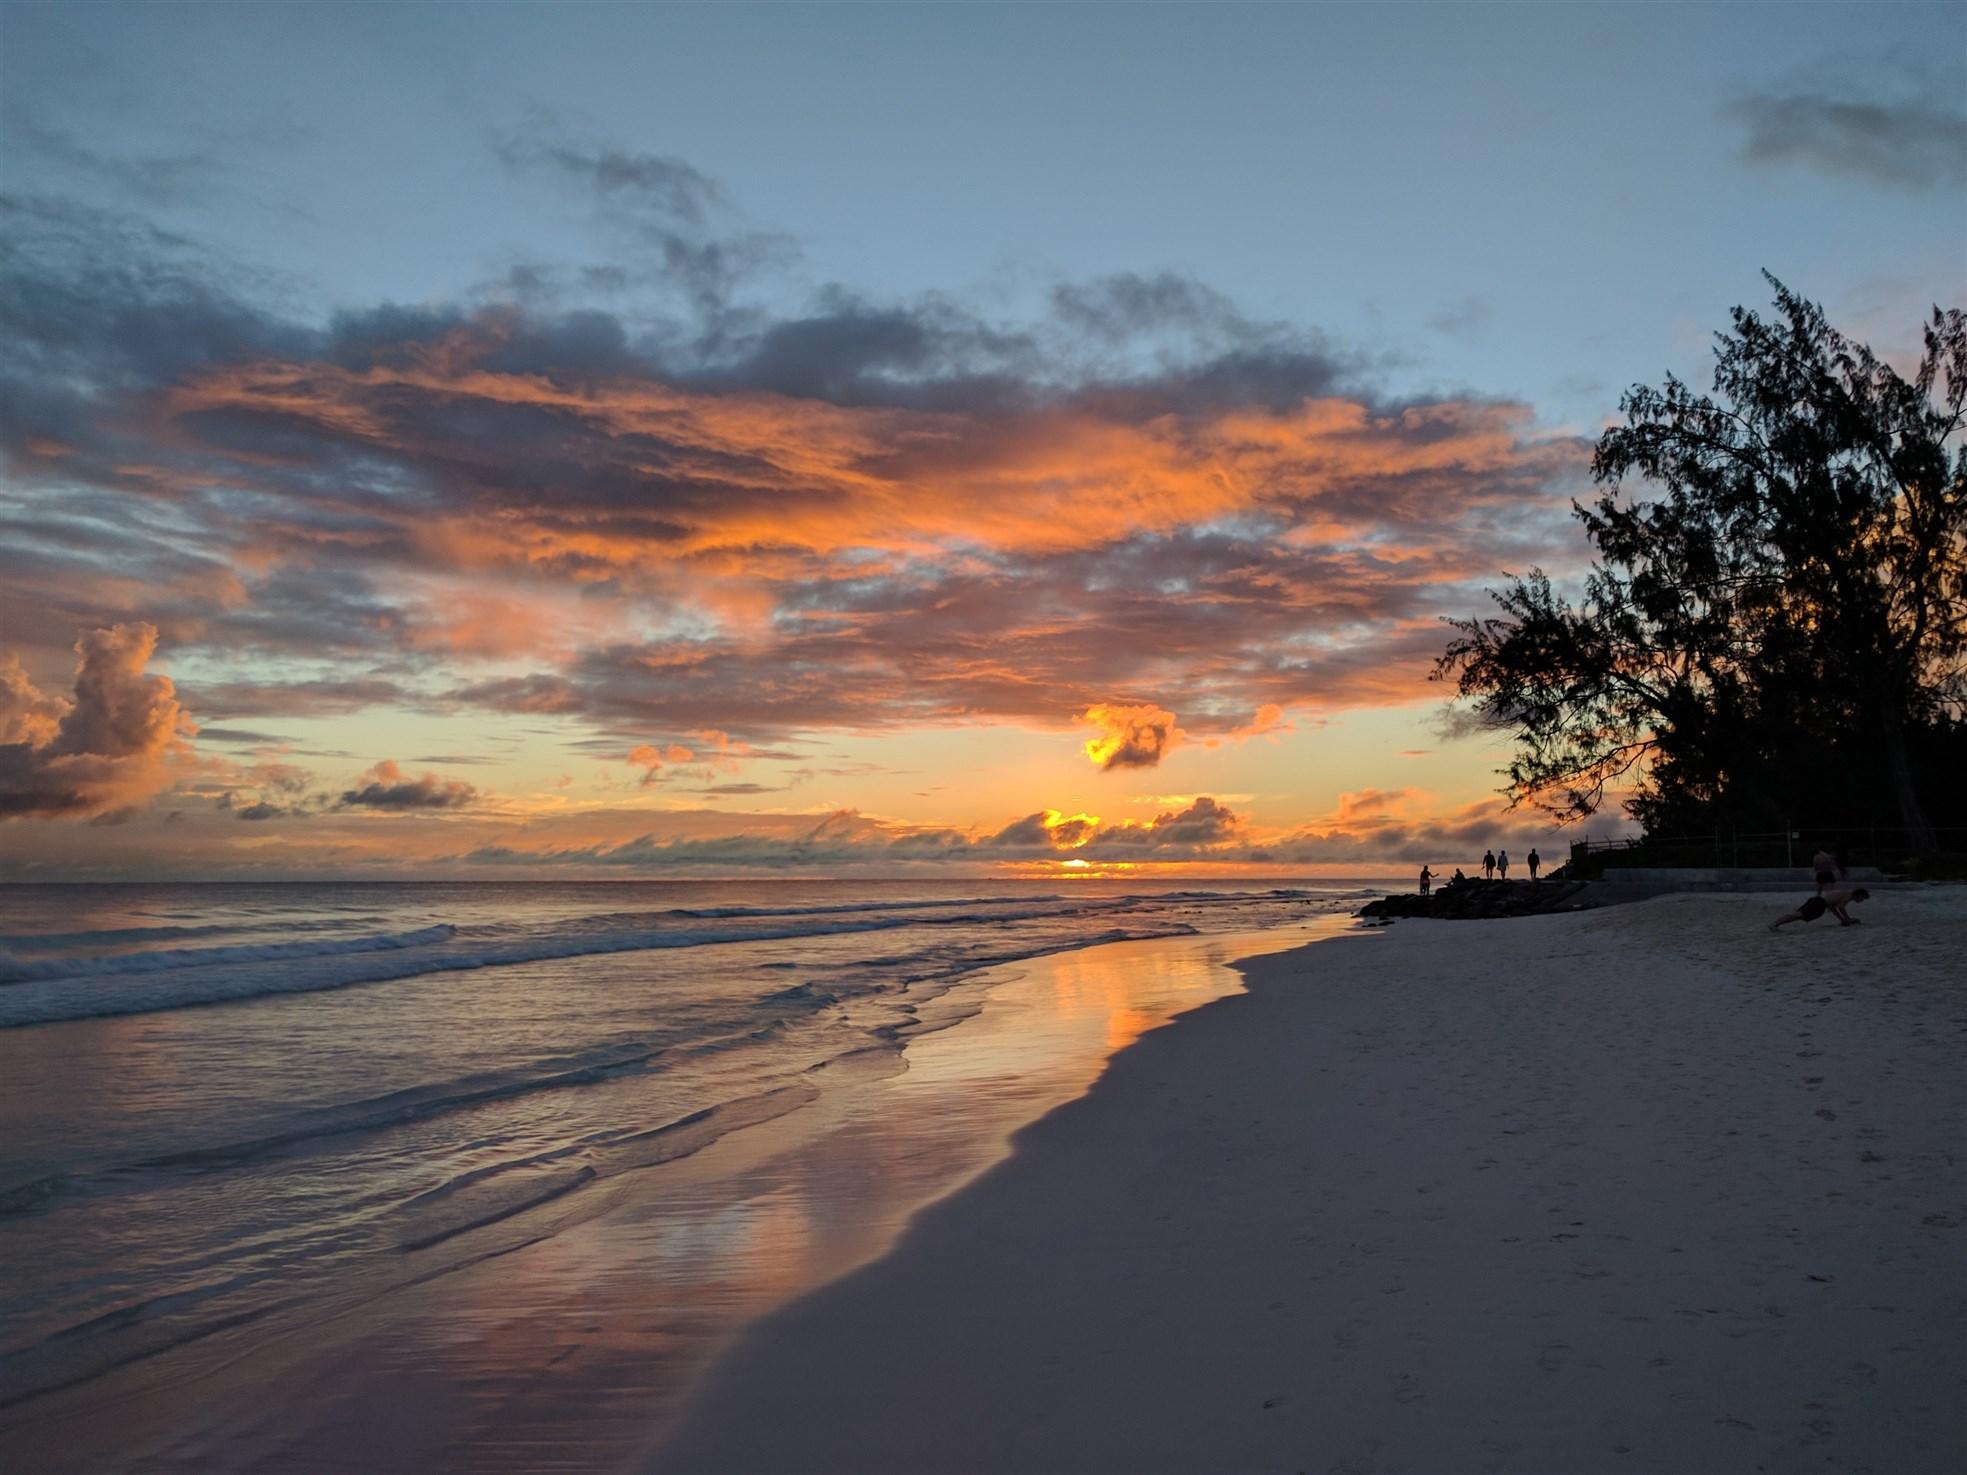 Accra Beach Sunset, Barbados